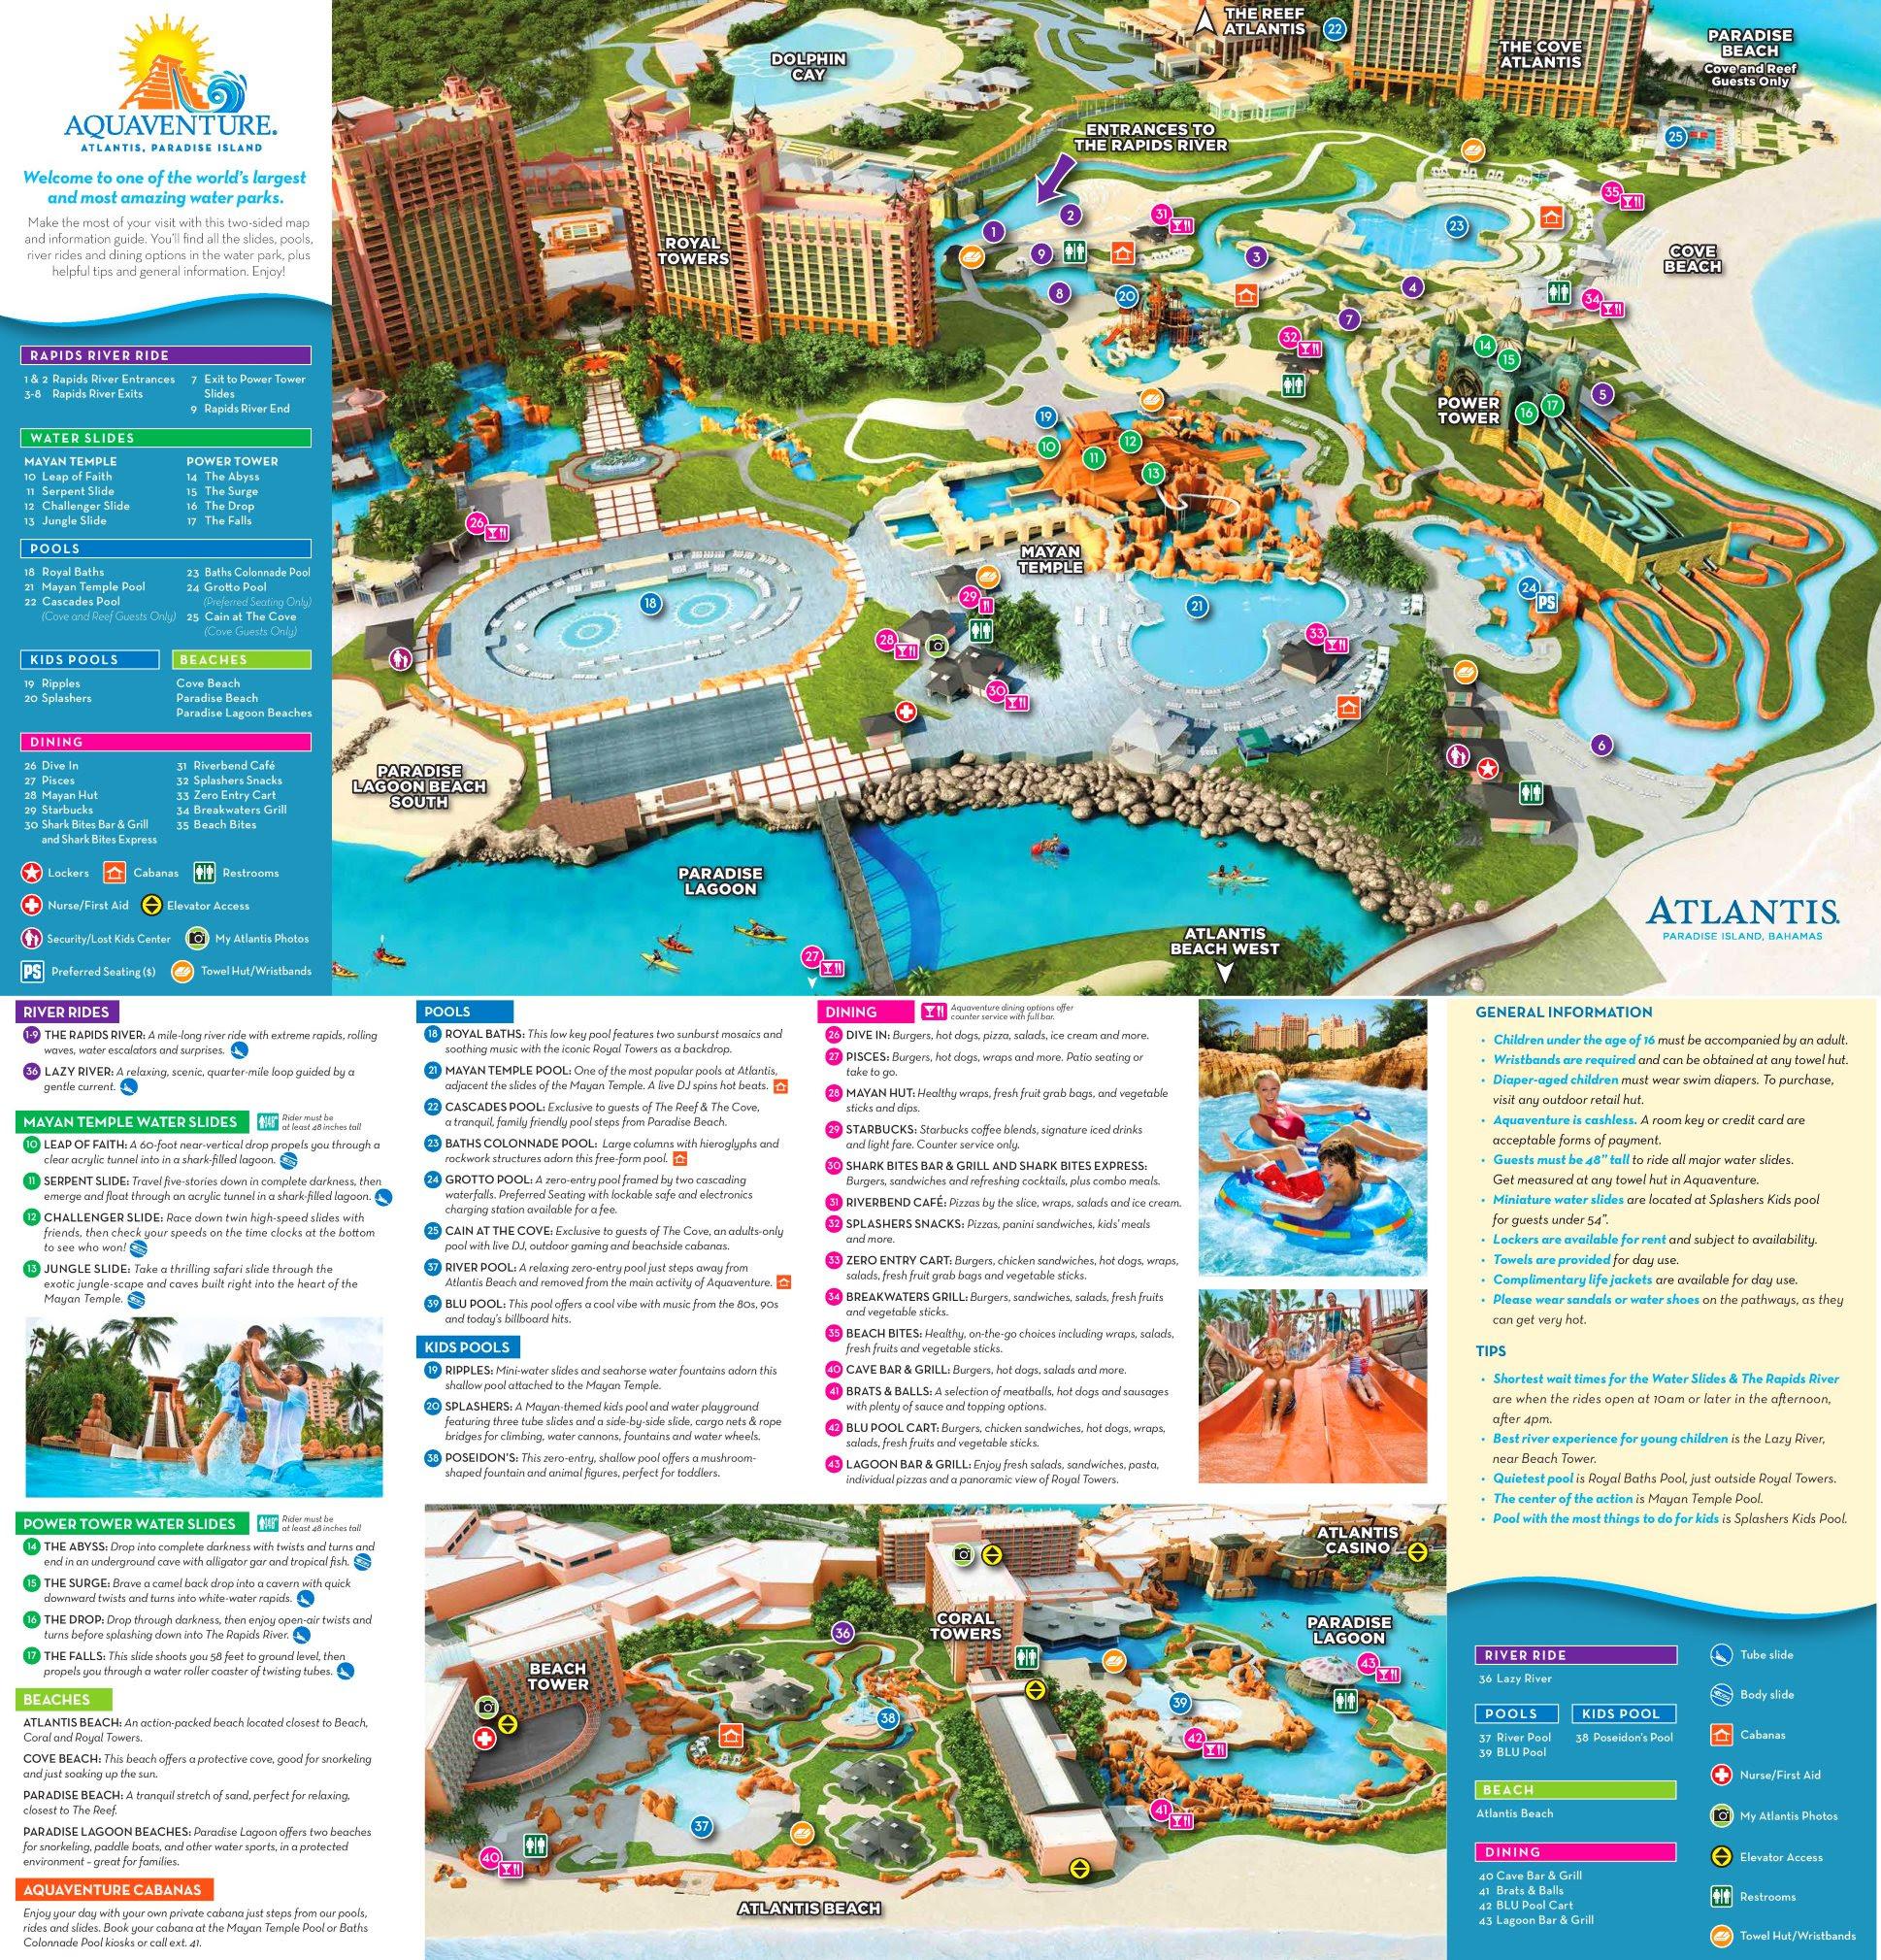 Atlantis Bahamas Map Of Resort